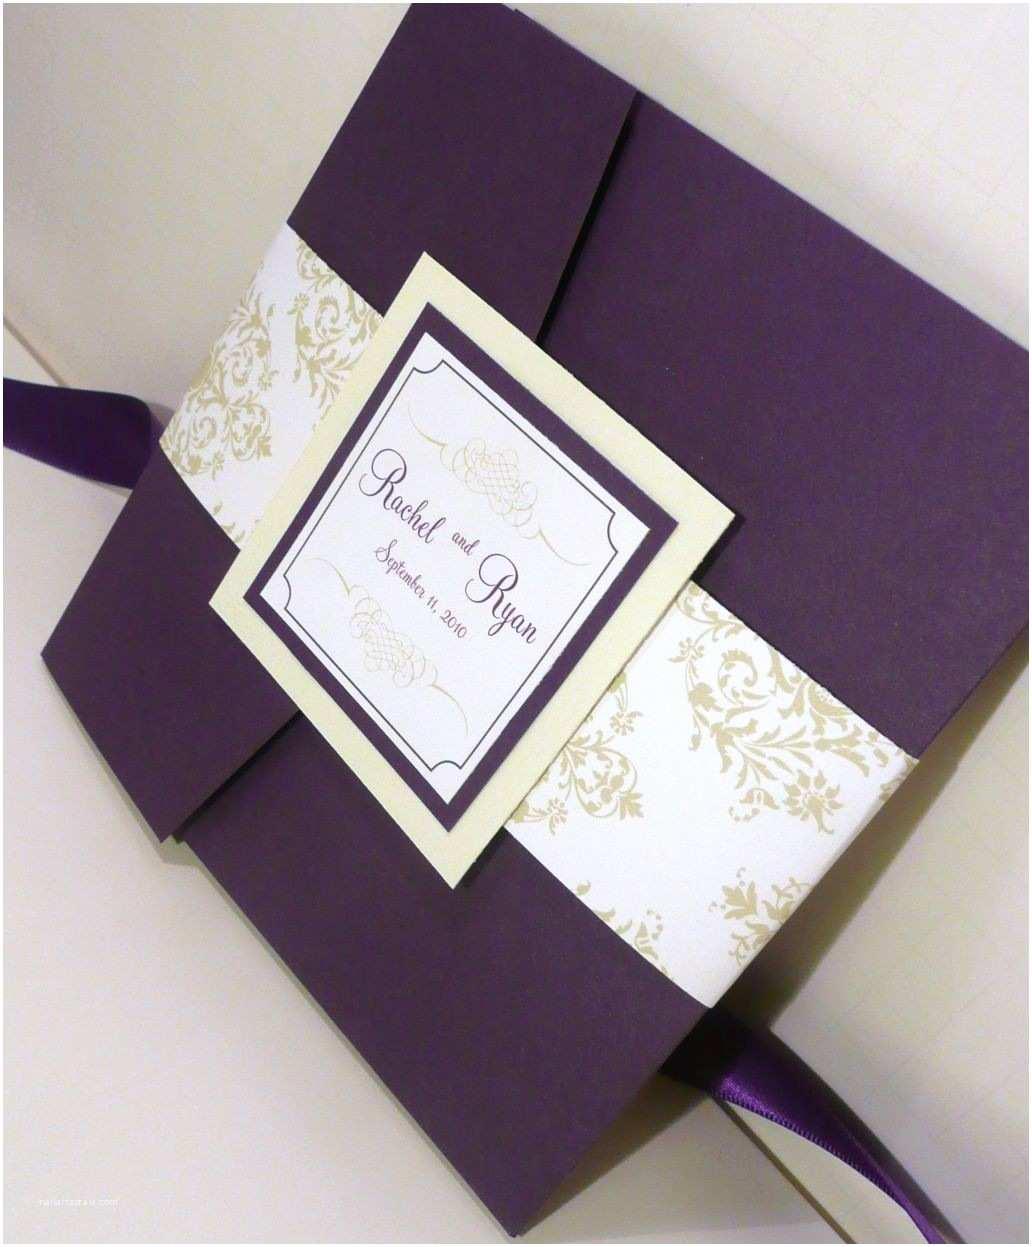 Wedding Invitation Design Images Party Invitation Envelopes for Wedding Invites In White